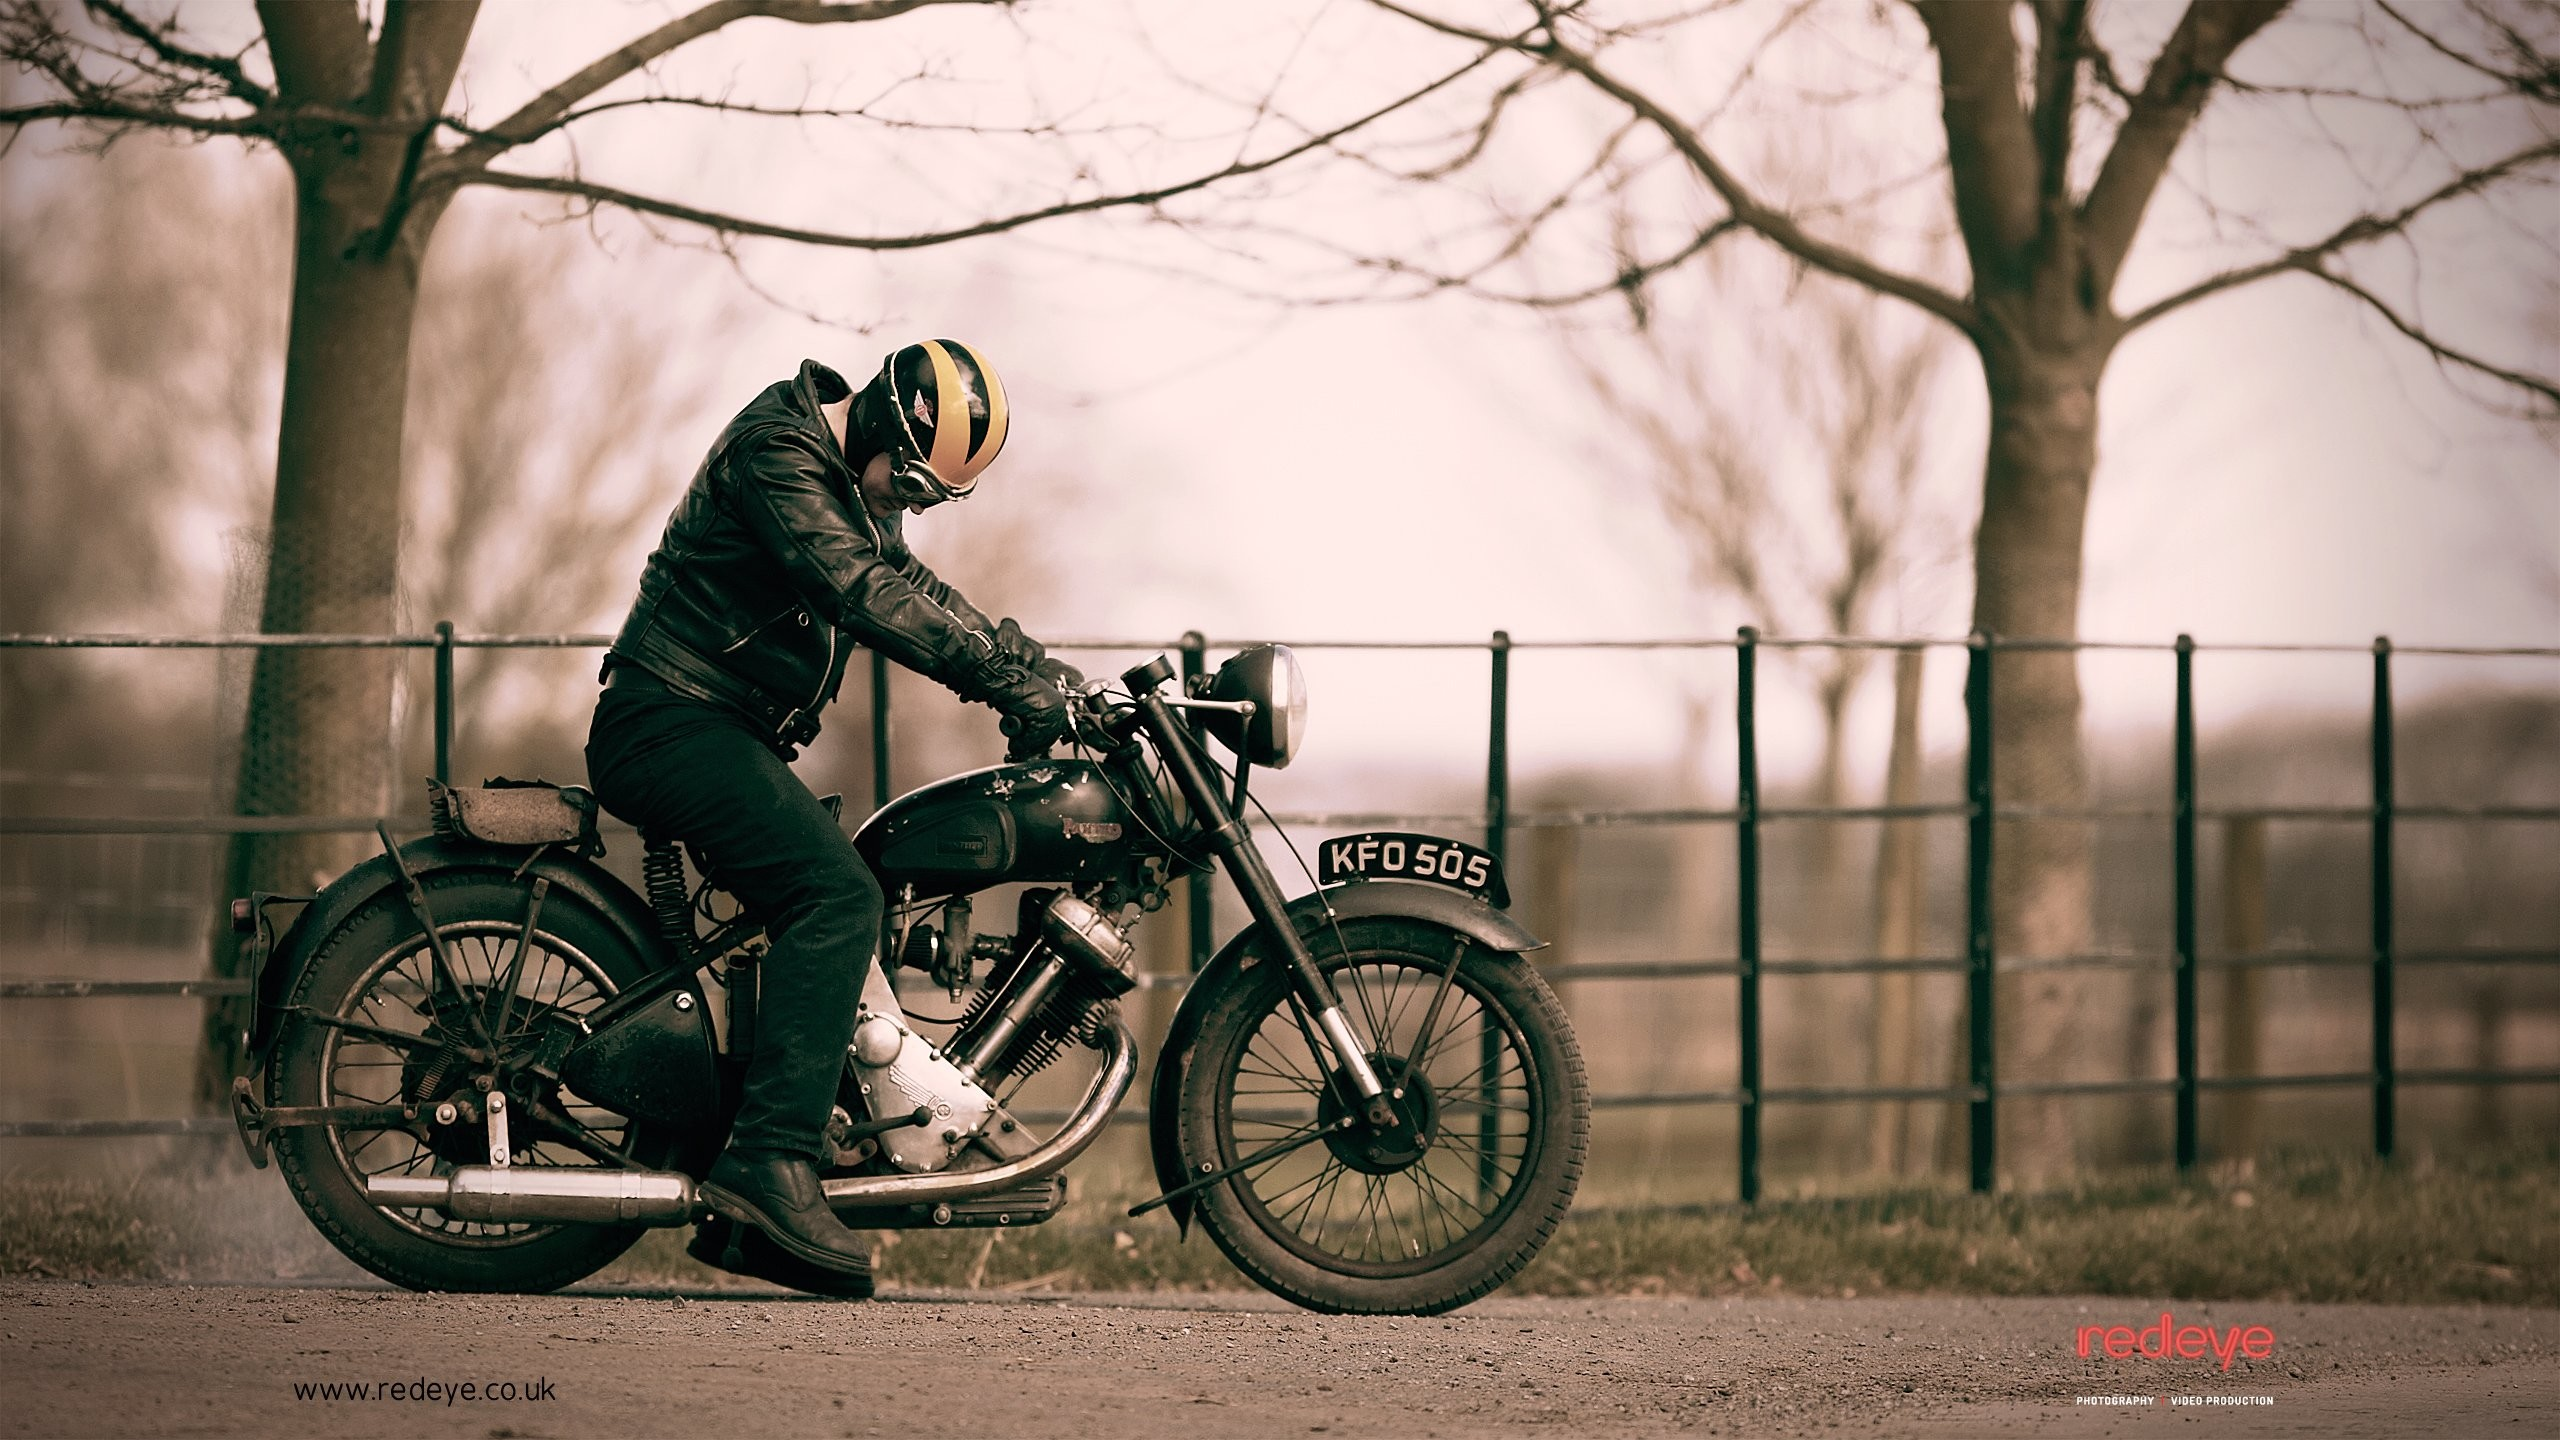 Luxury Motorcycle Hd Wallpapers: Vintage Motorcycle Wallpaper (66+ Images